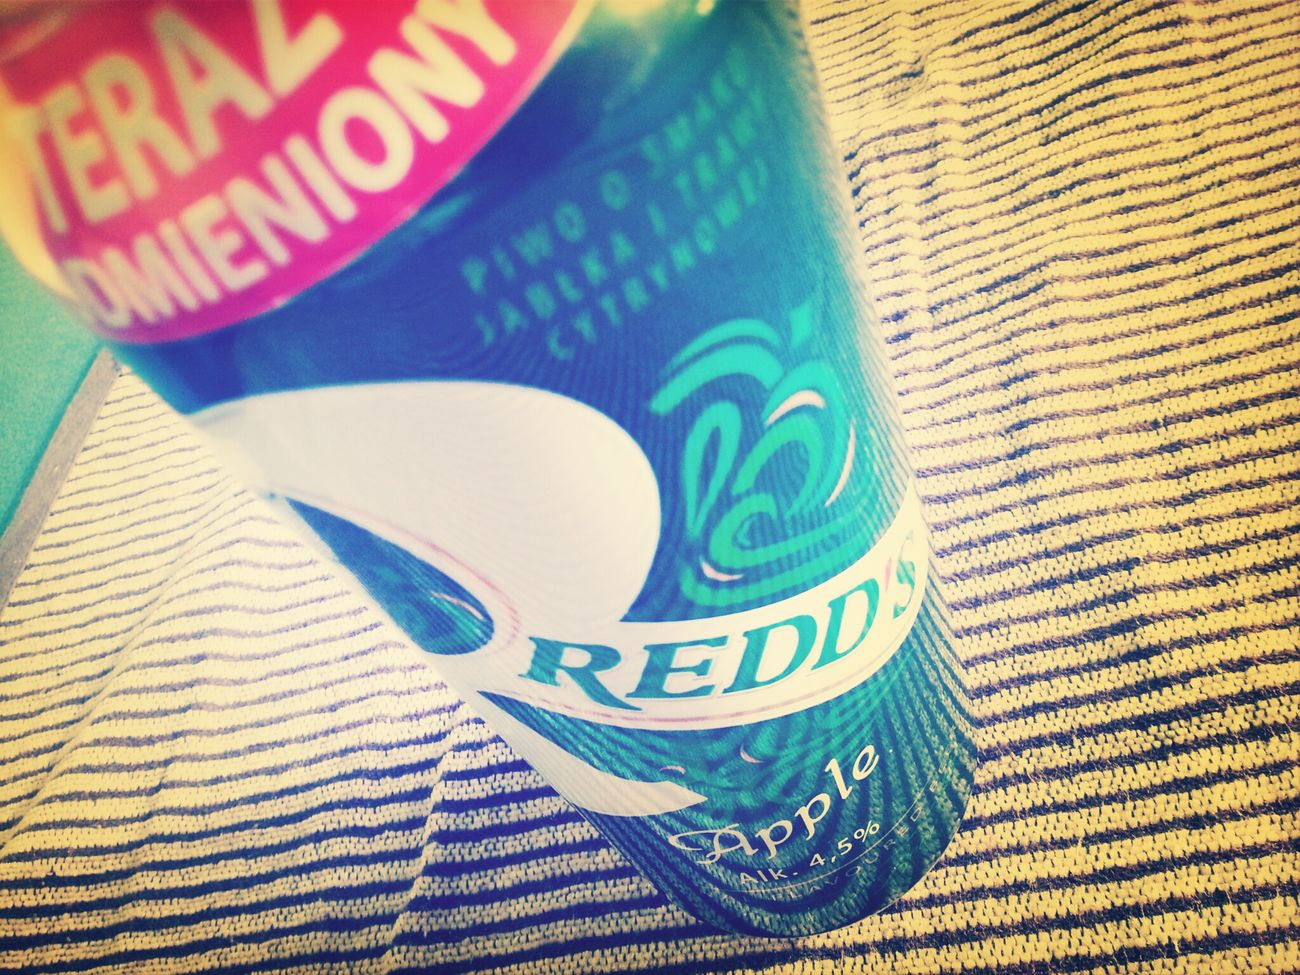 Chillen<3 Relaxing